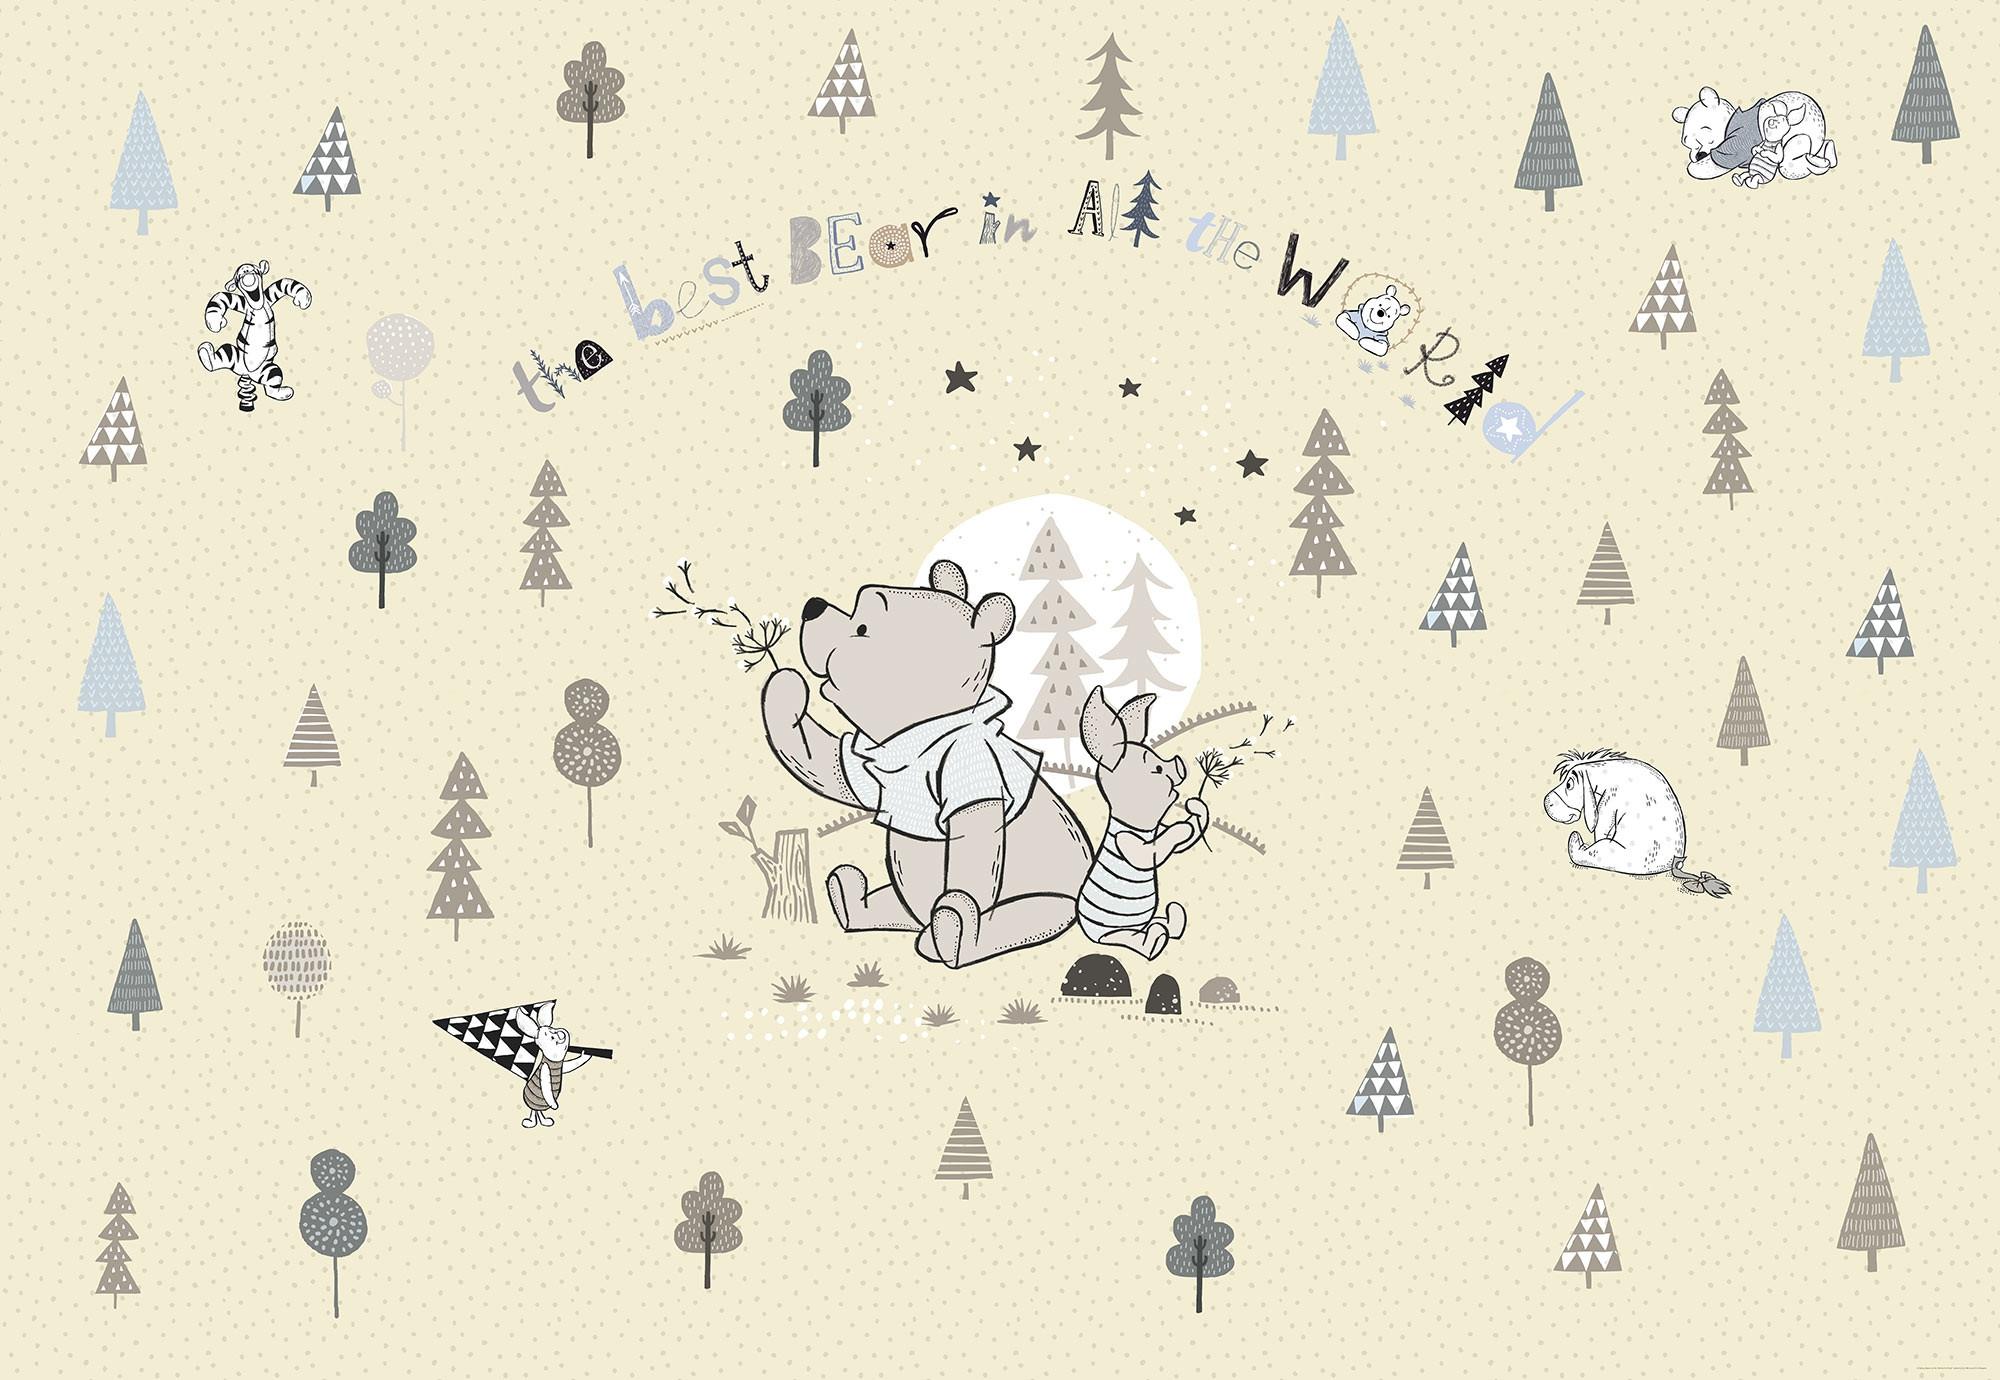 Winnie Pooh Best Bear